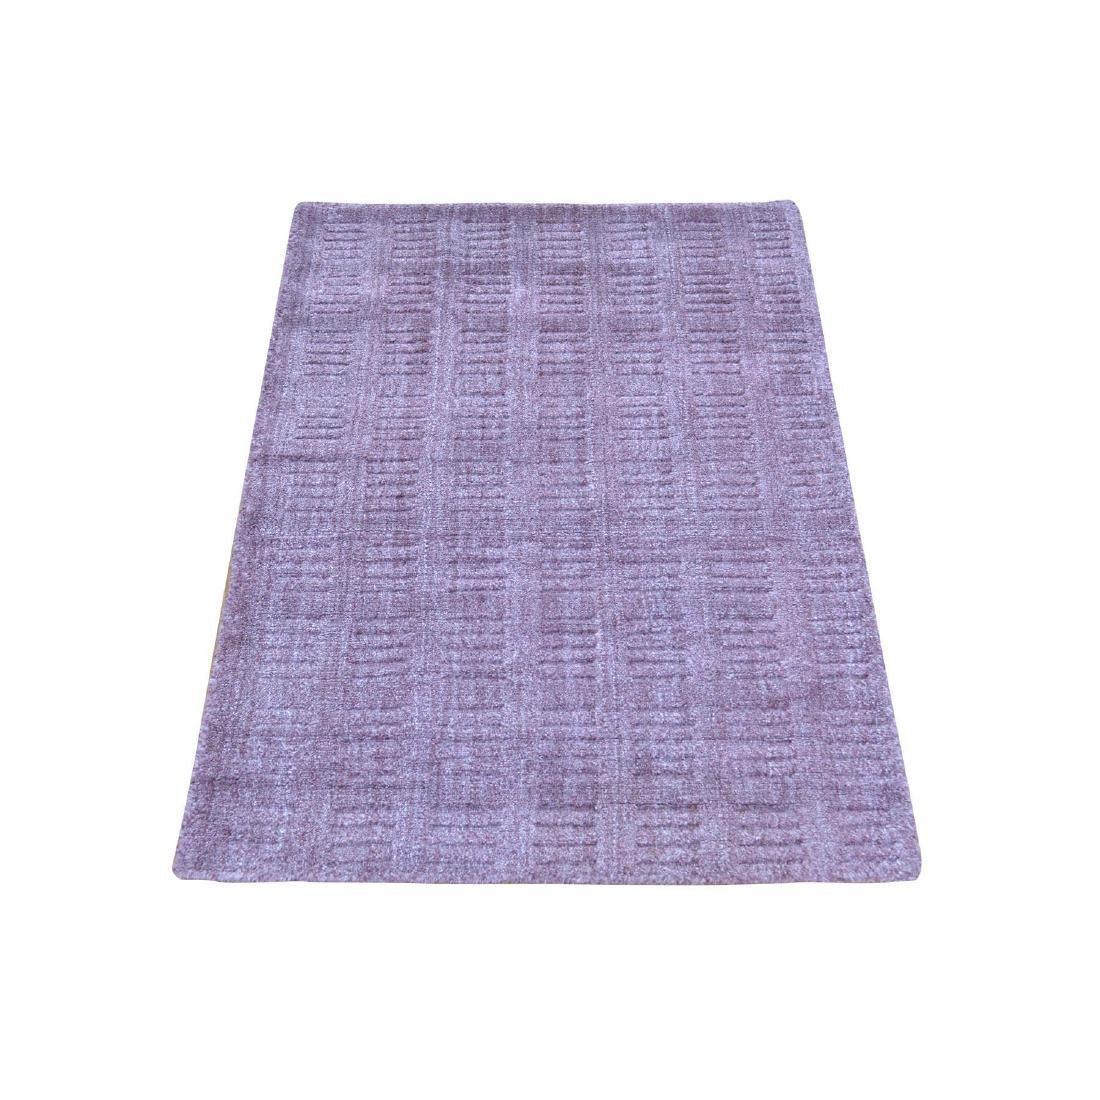 Tone on Tone Purple Hand Loomed Wool and Silk Rug 2x3